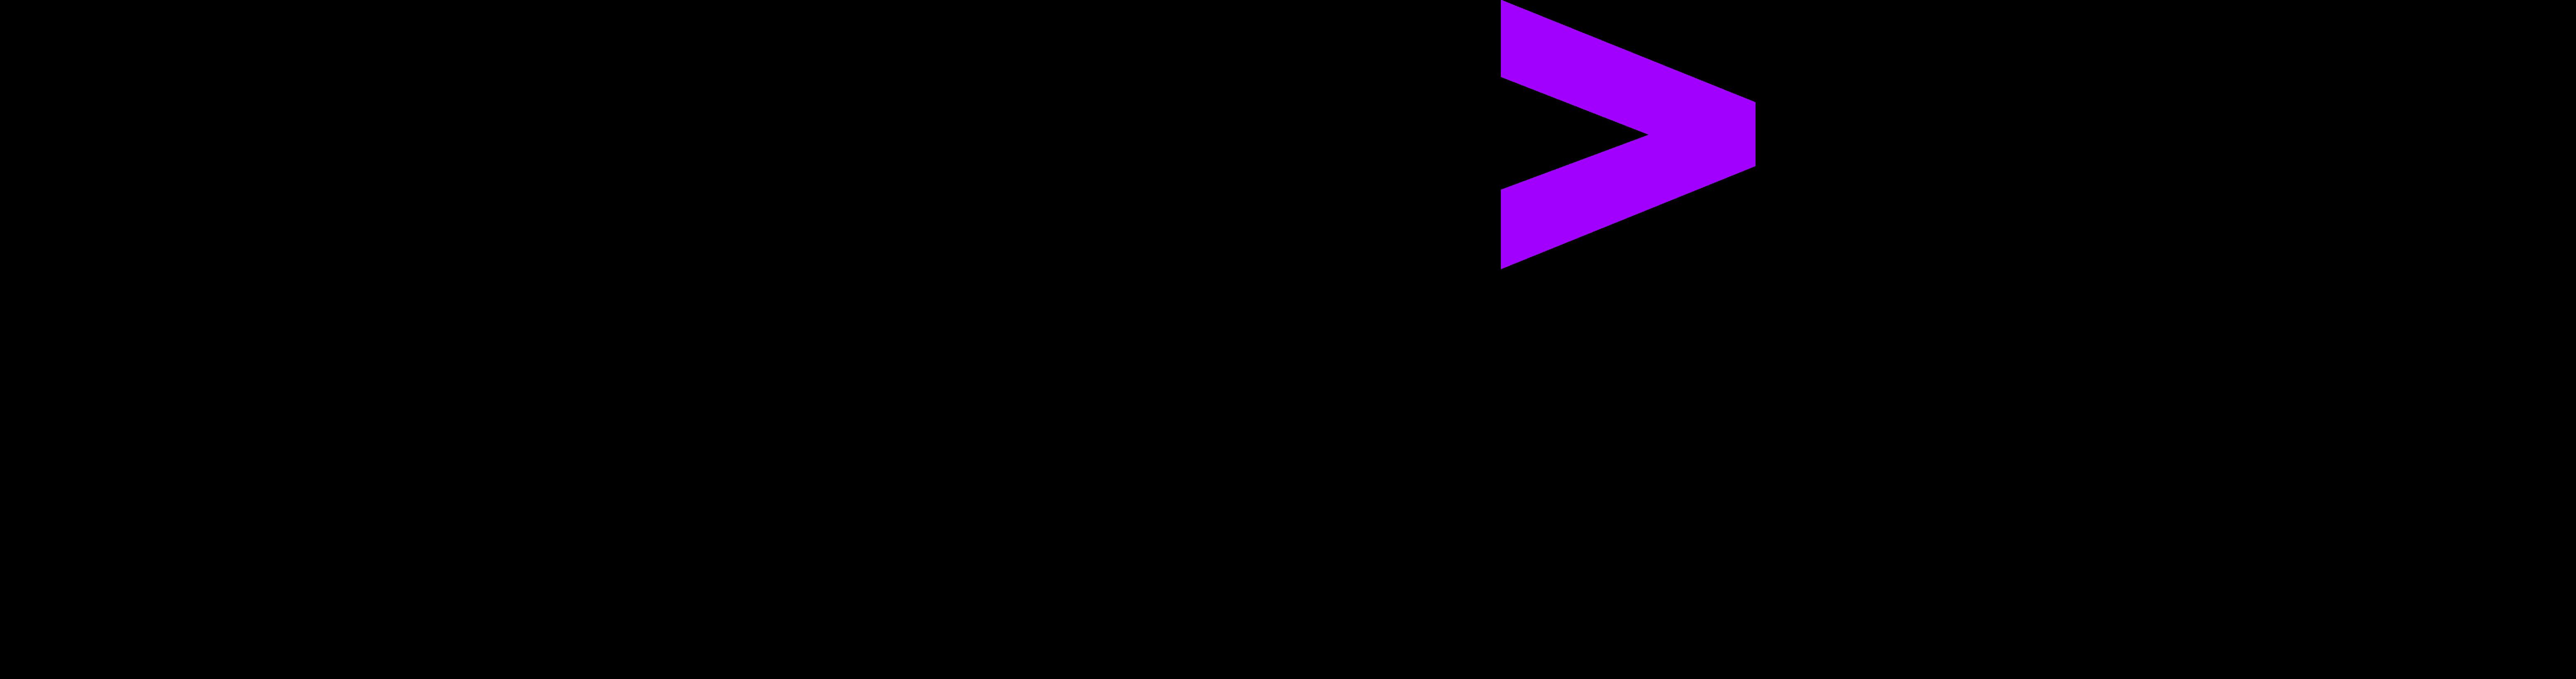 Blockchain Series Sponsor